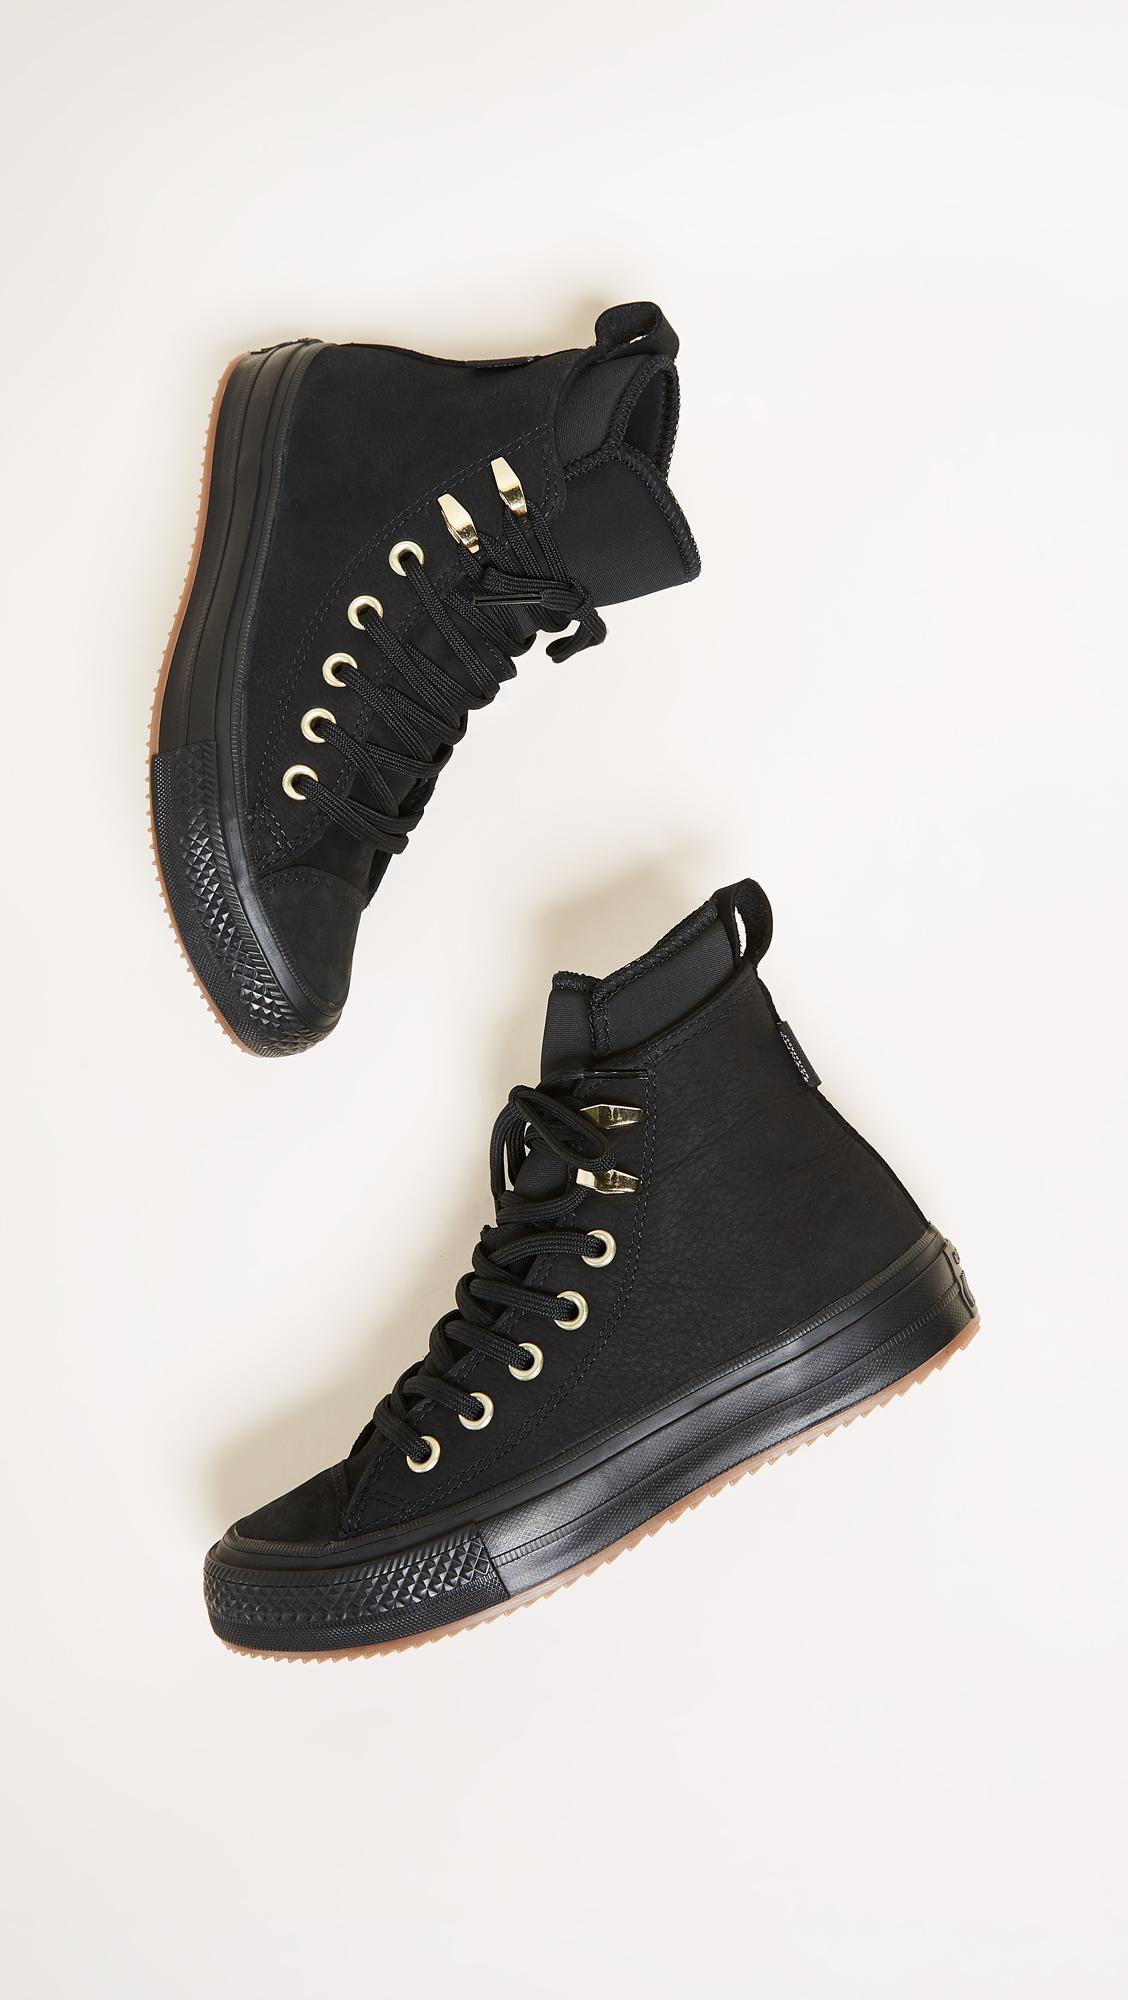 79910e4dda6 Converse Chuck Taylor All Star WP Sneakers